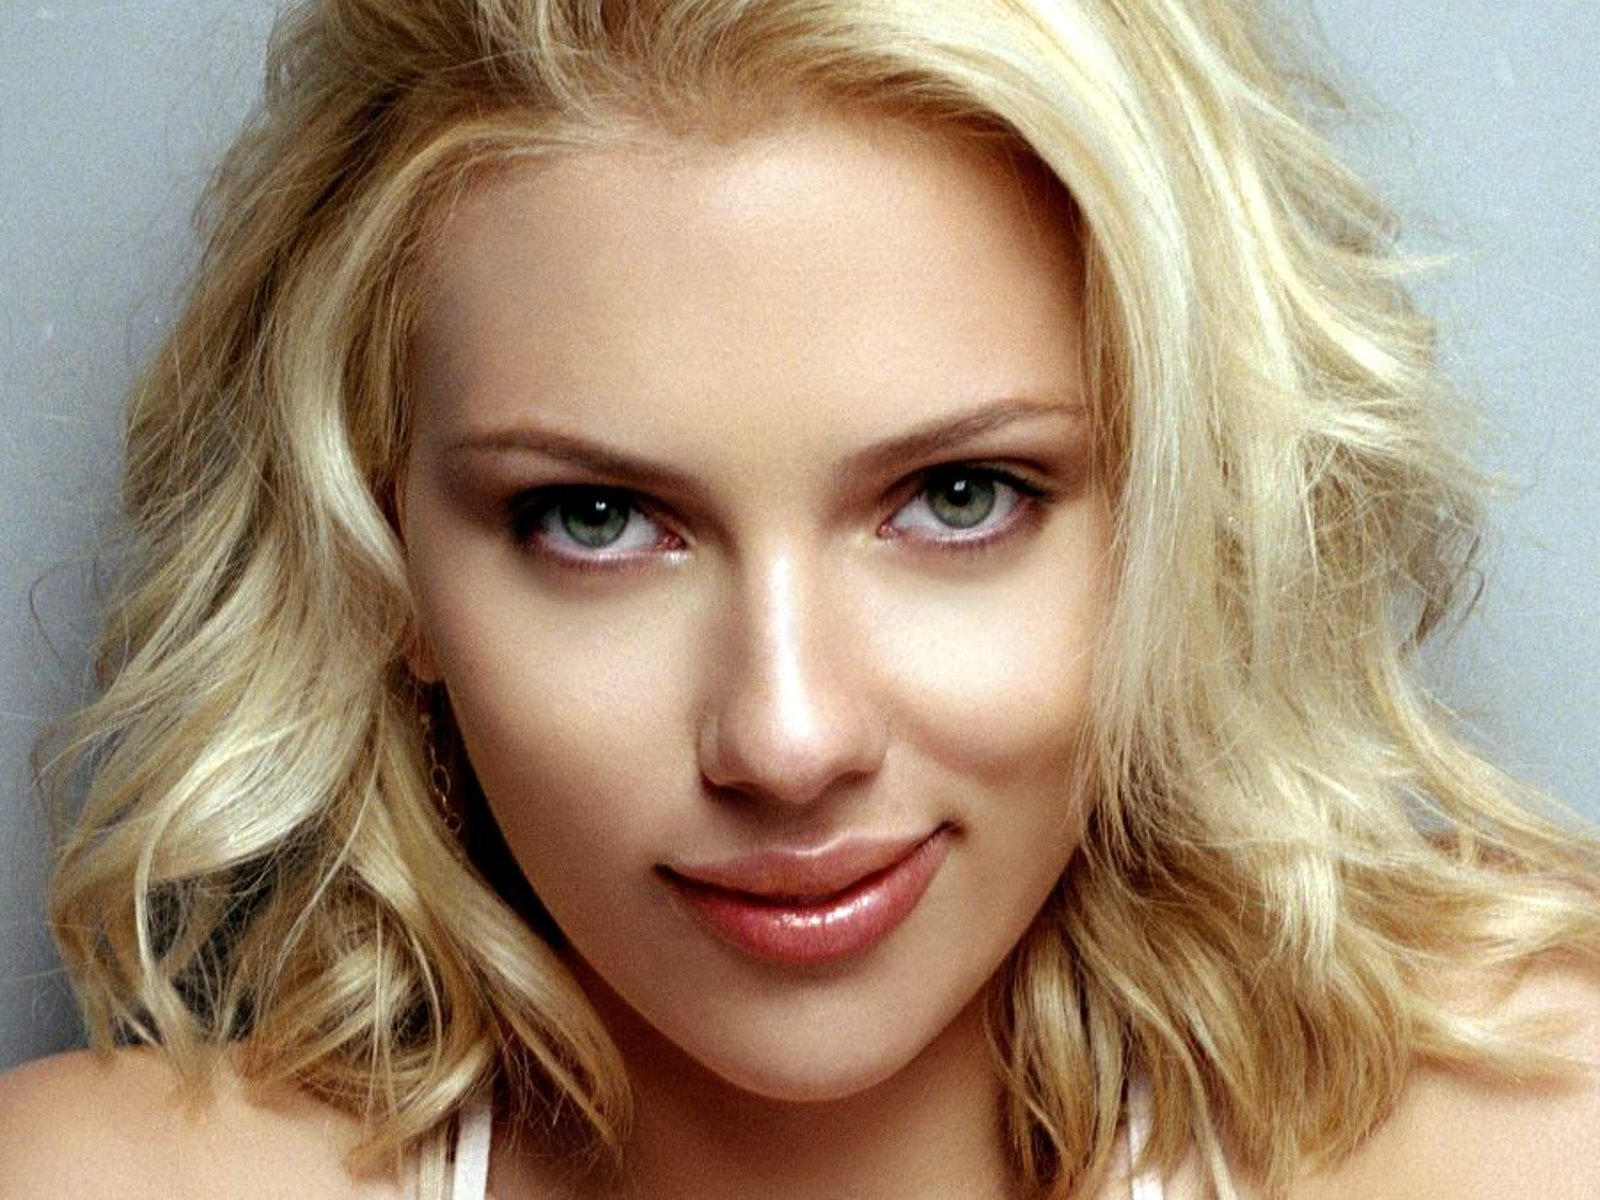 http://1.bp.blogspot.com/-NUKZ0RH_FDg/UFRzXcRqPVI/AAAAAAAABOo/rCVebUxMlFk/s1600/Scarlett_Johansson.jpg